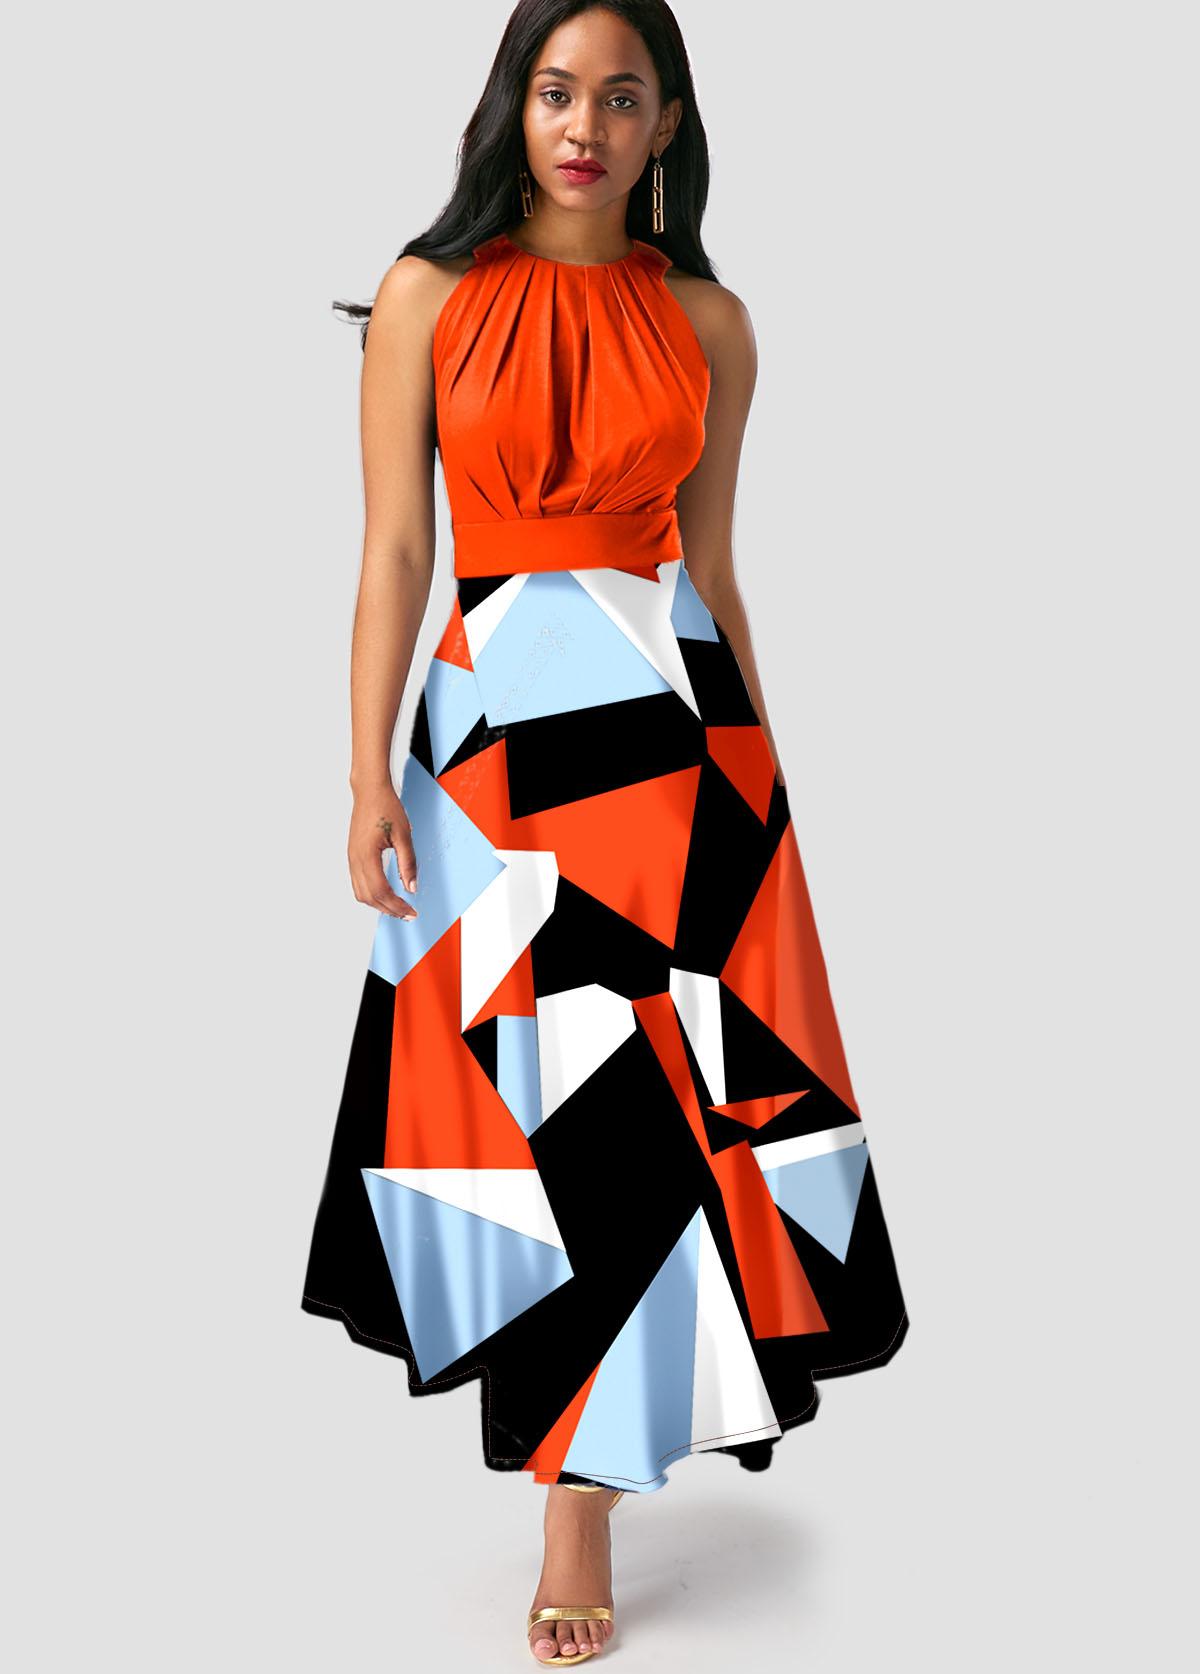 ROTITA Sleeveless Geometric Print Orange Maxi Dress